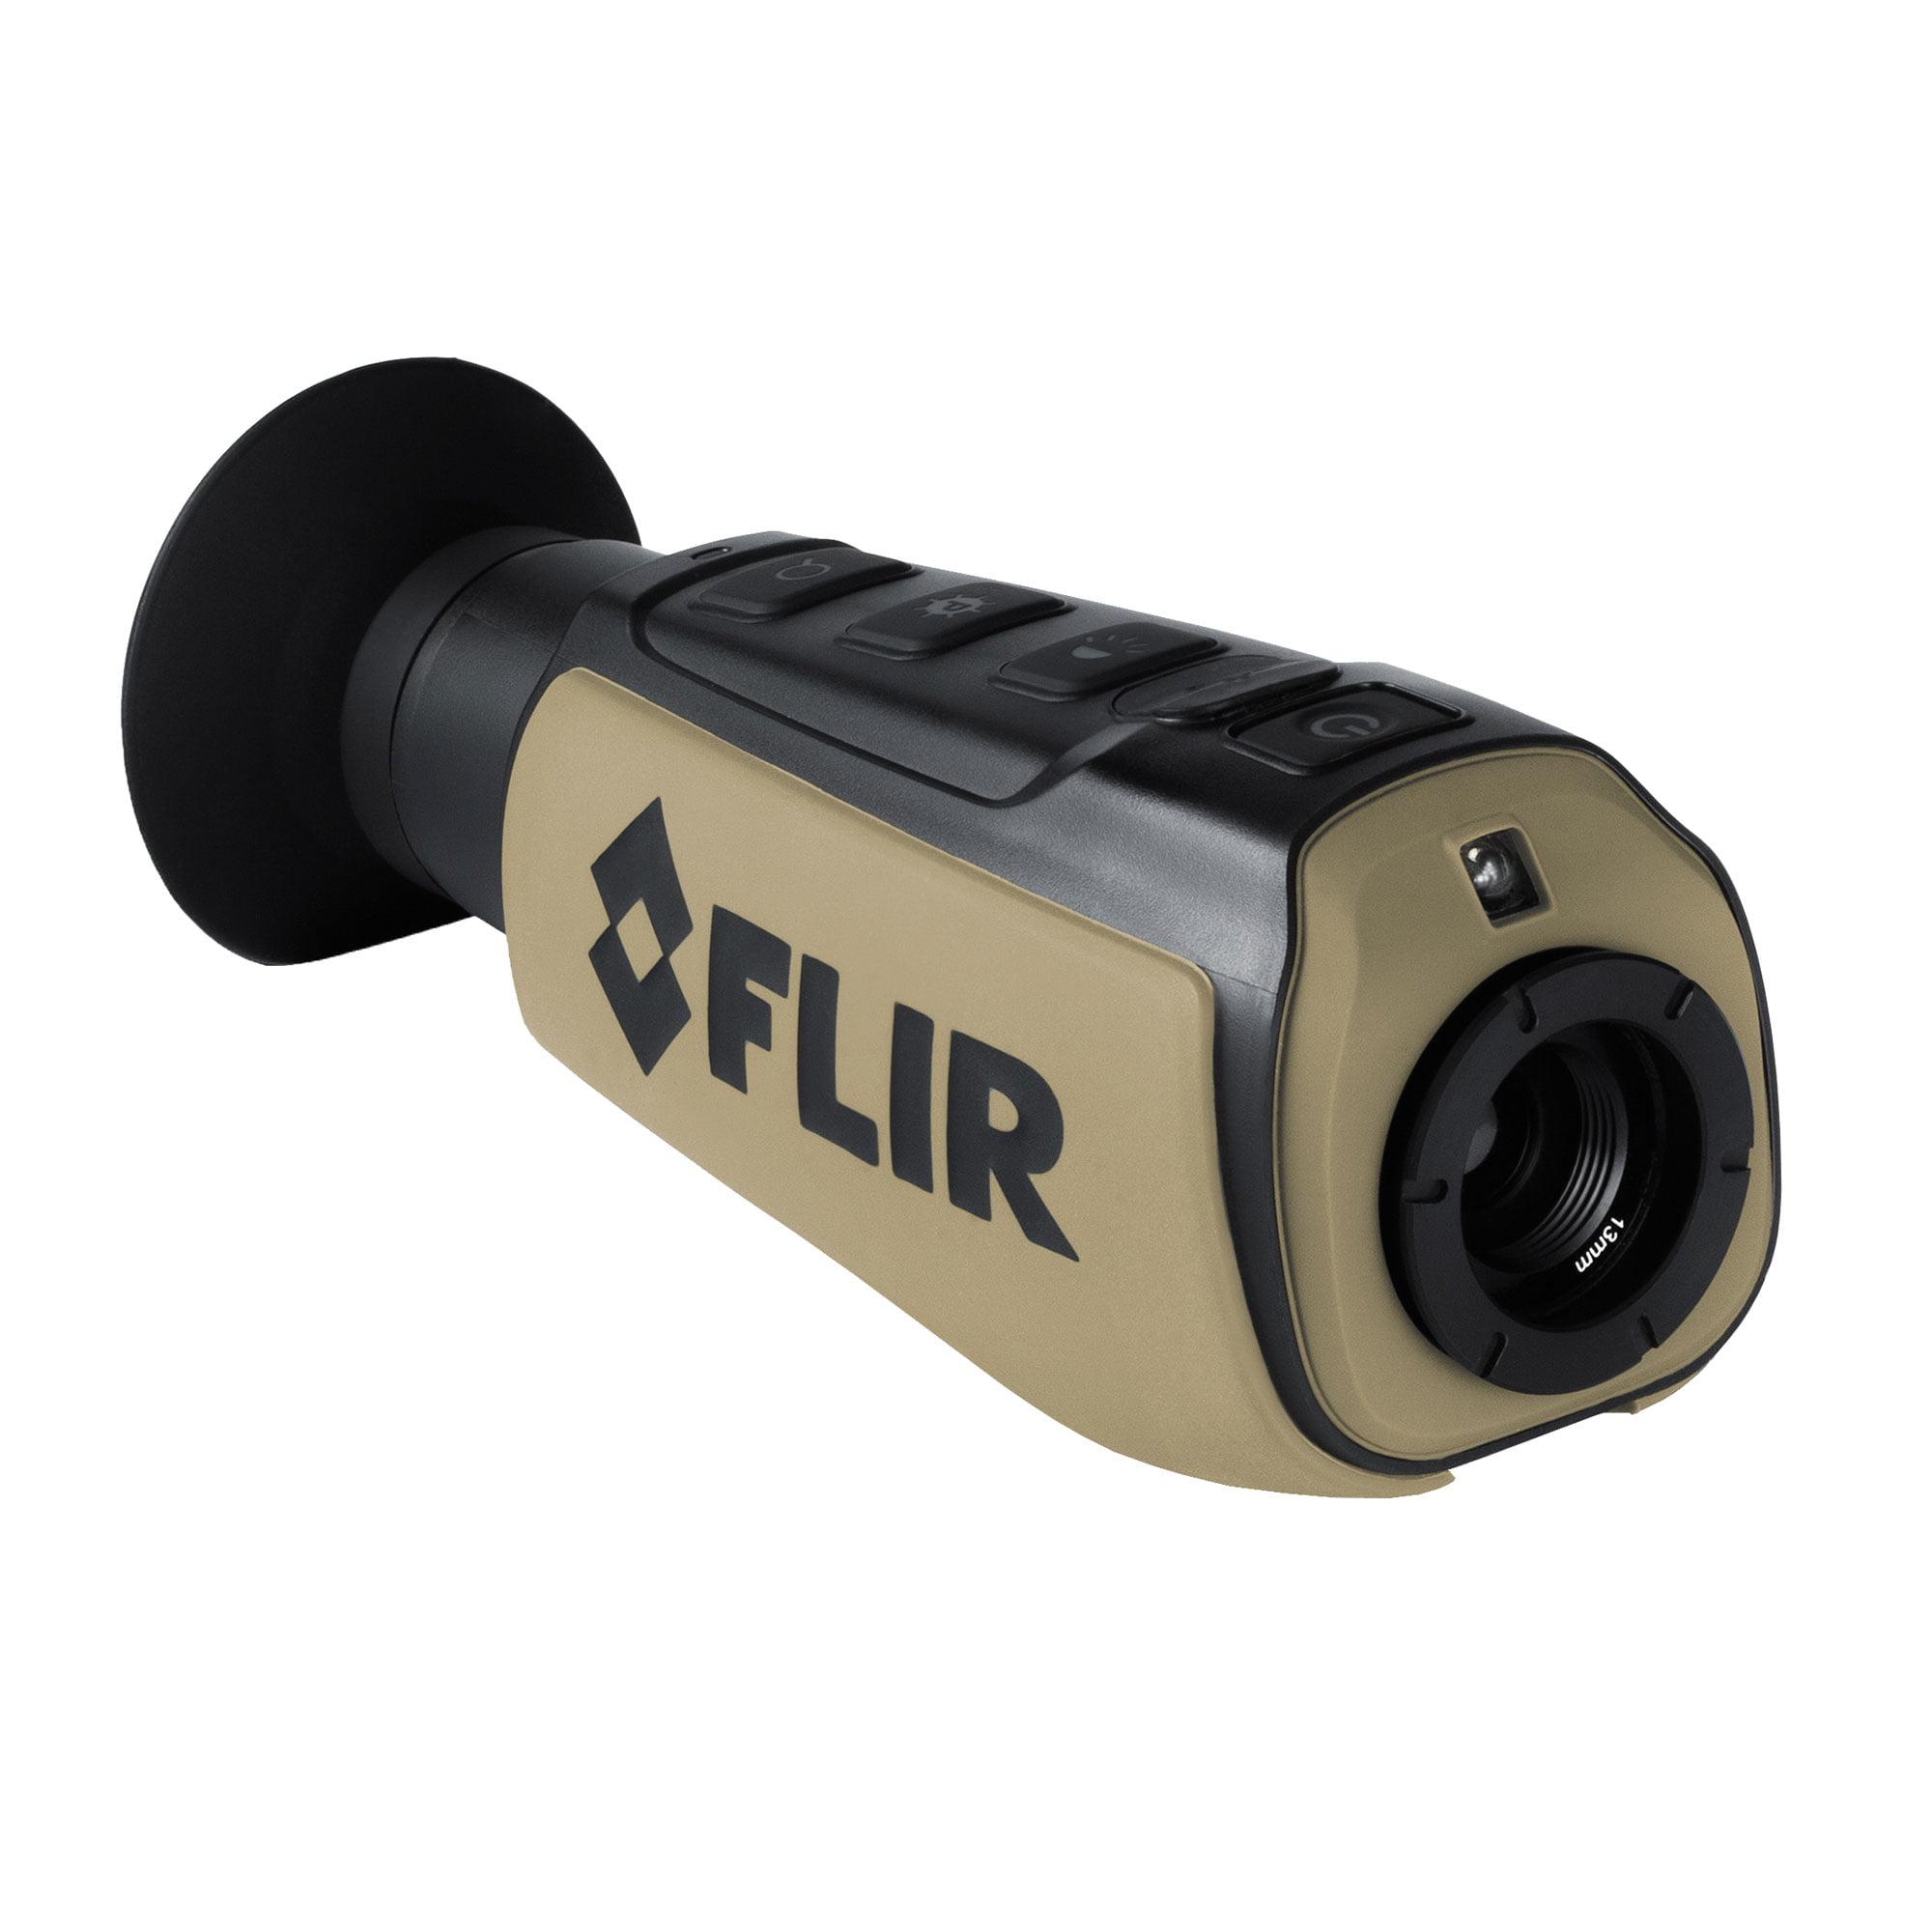 FLIR Scout III 240 30Hz Video 640 x 480 Night Vision Imaging Thermal Monocular